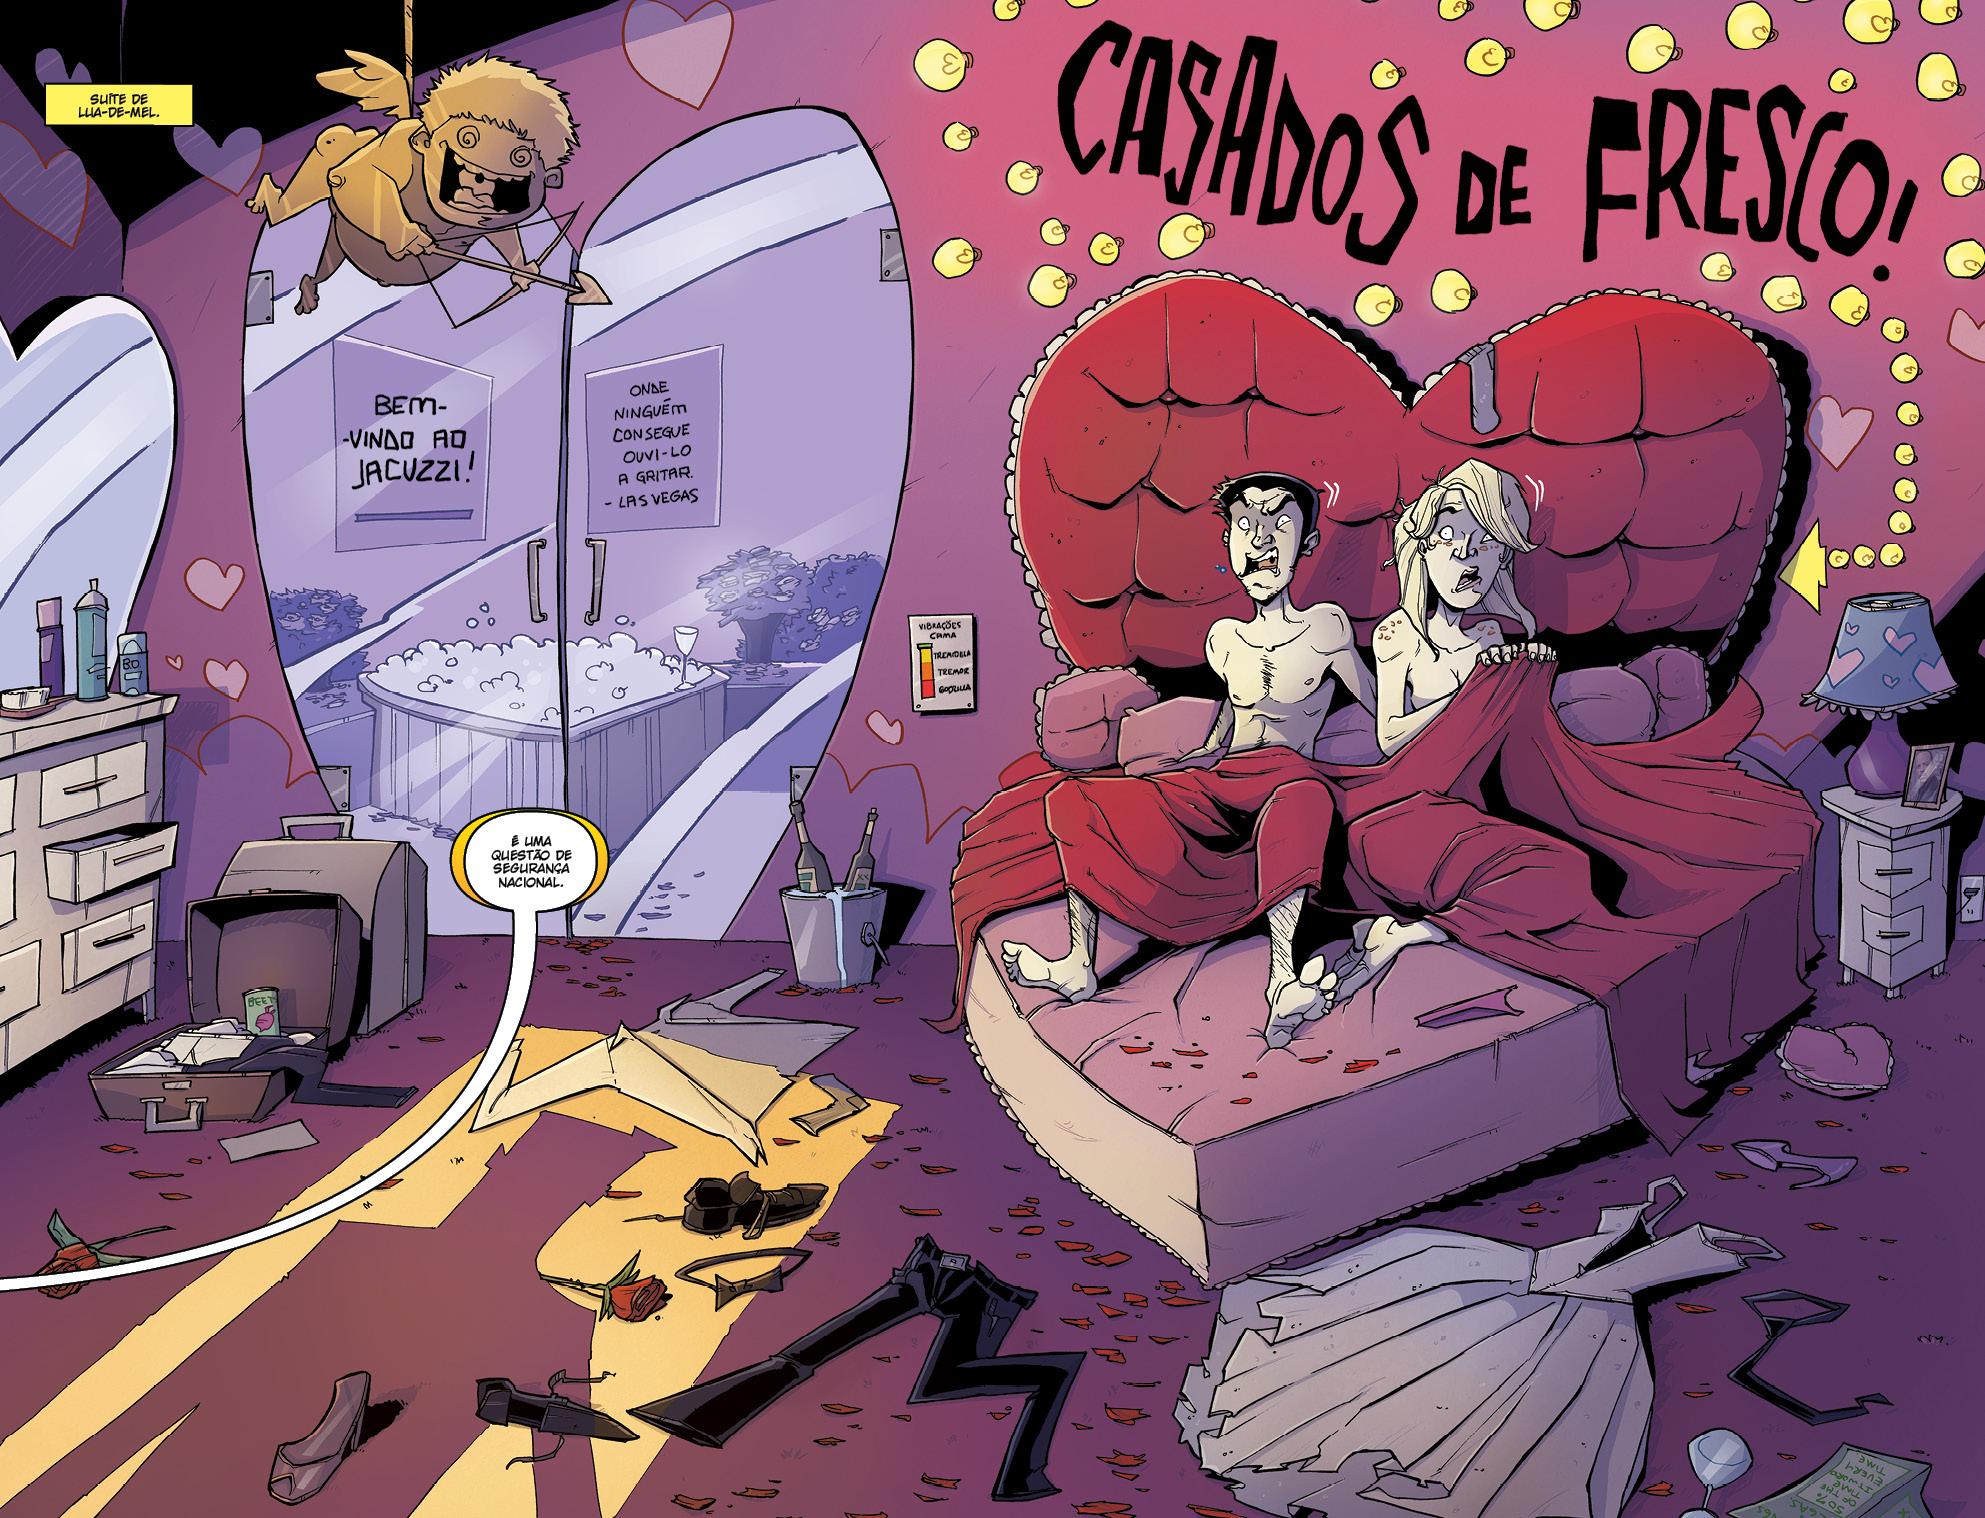 Tony CHU Detective Canibal vol. 9 Granda Frango!